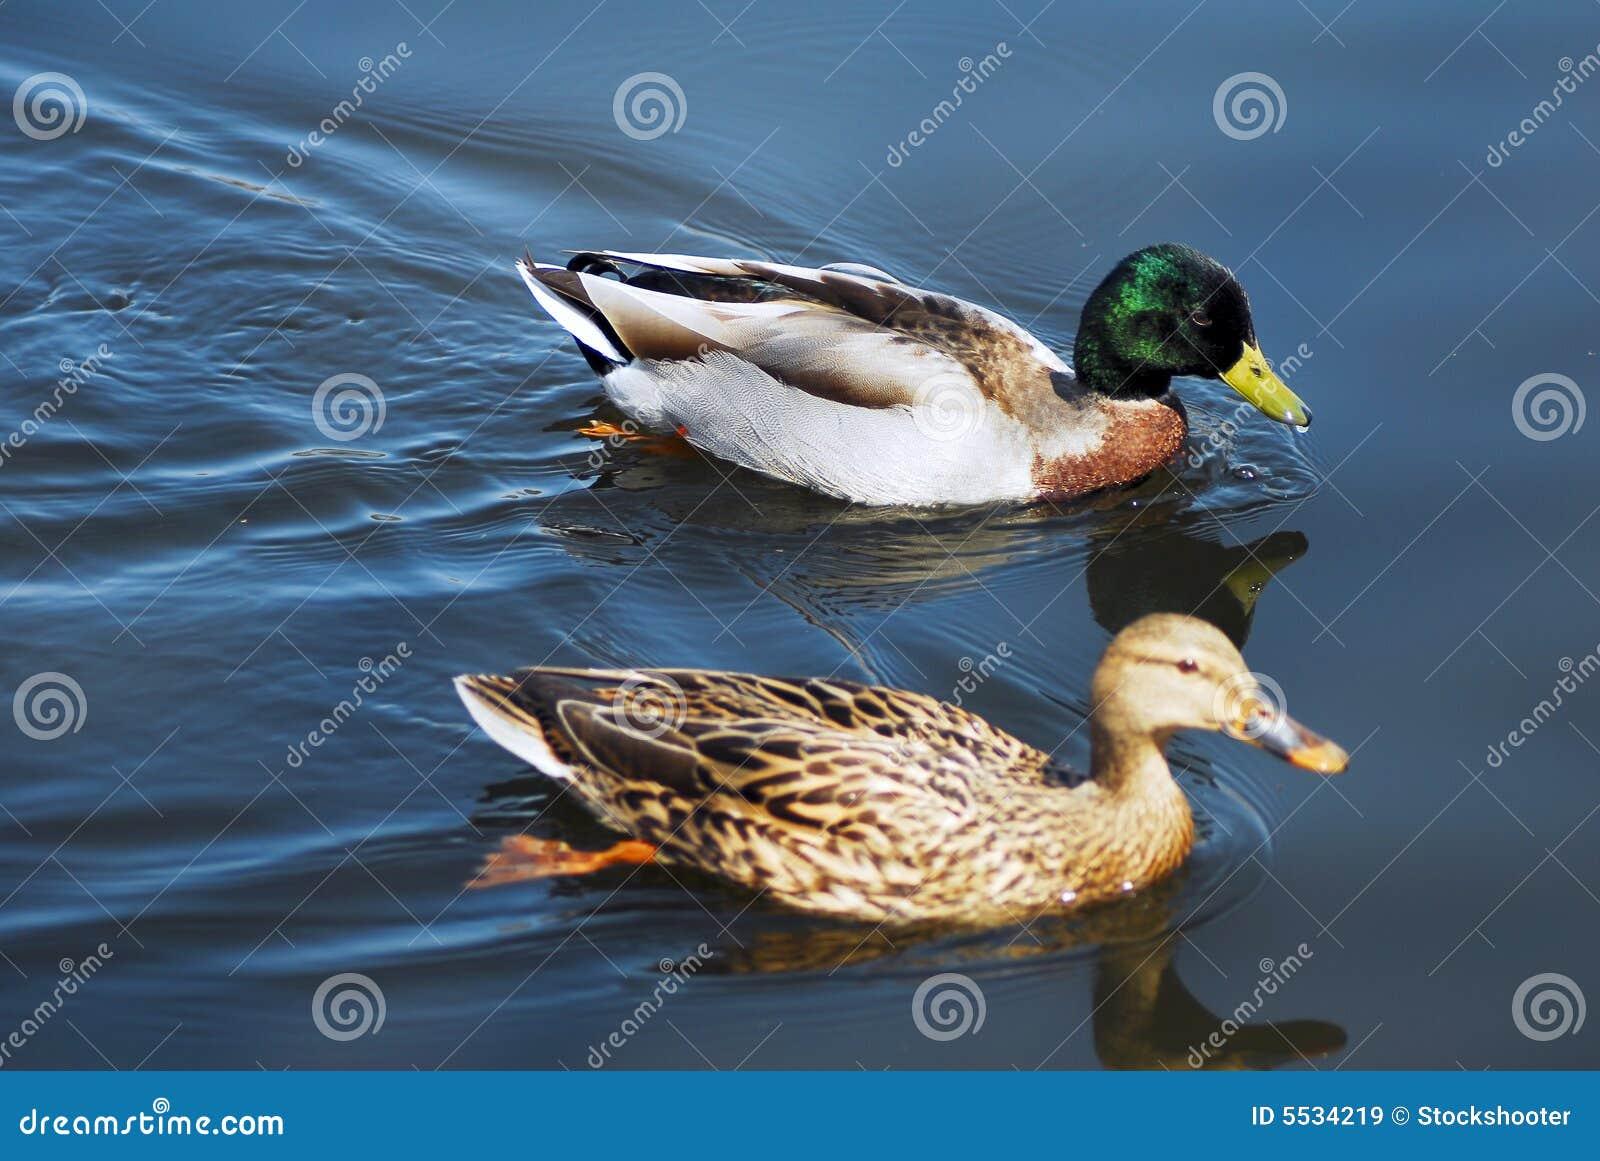 Mallard Ducks Swimming stock image. Image of meat, dish ...